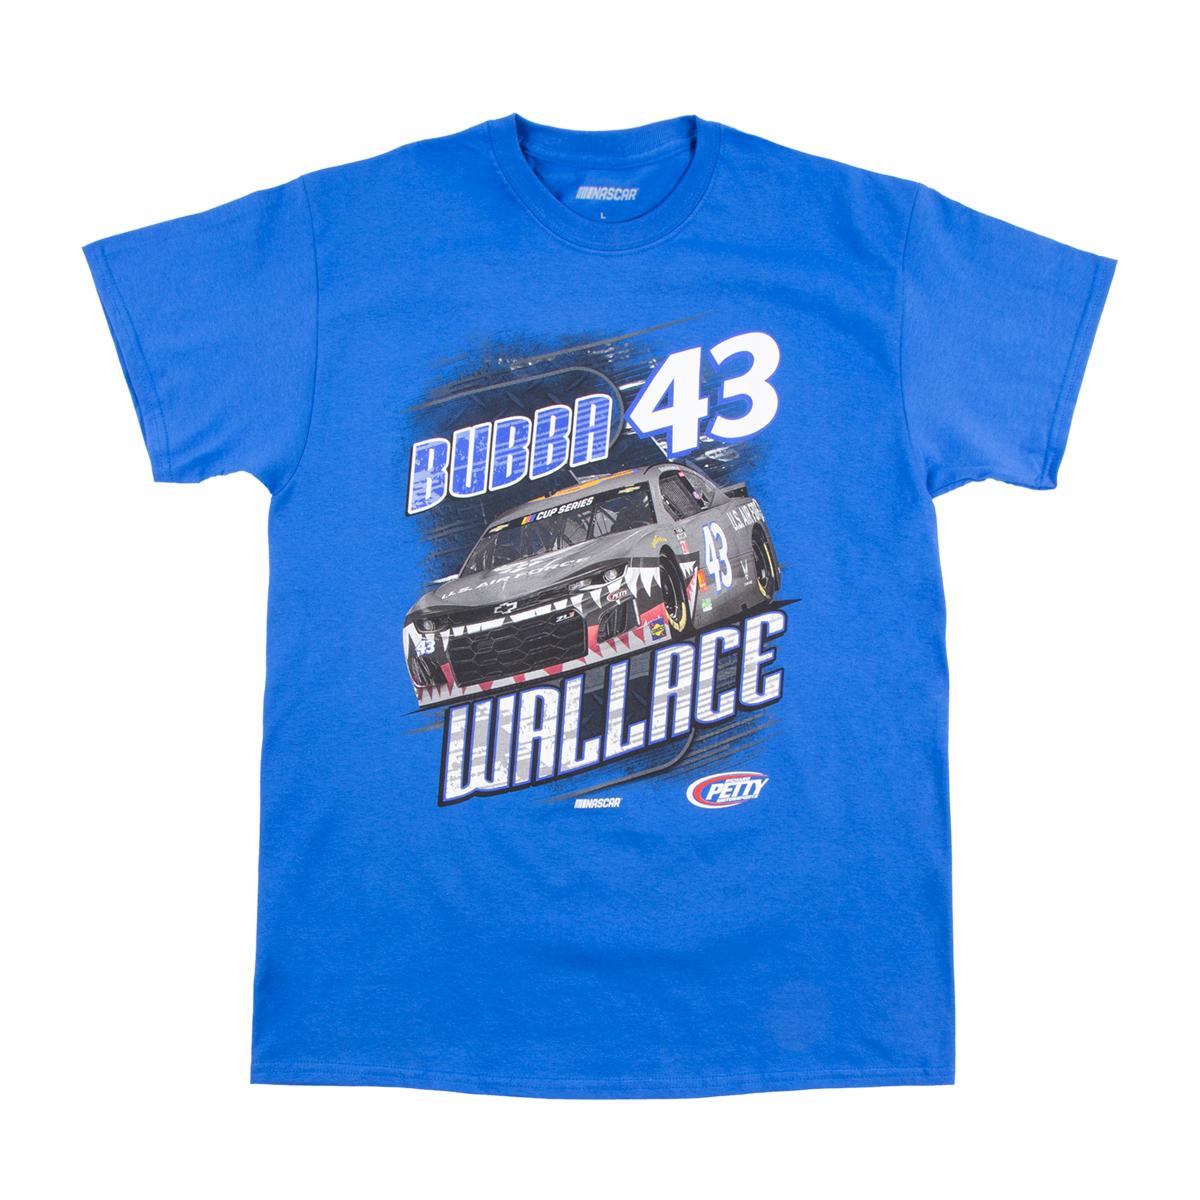 Bubba Wallace #43 2020 Camber T-shirt